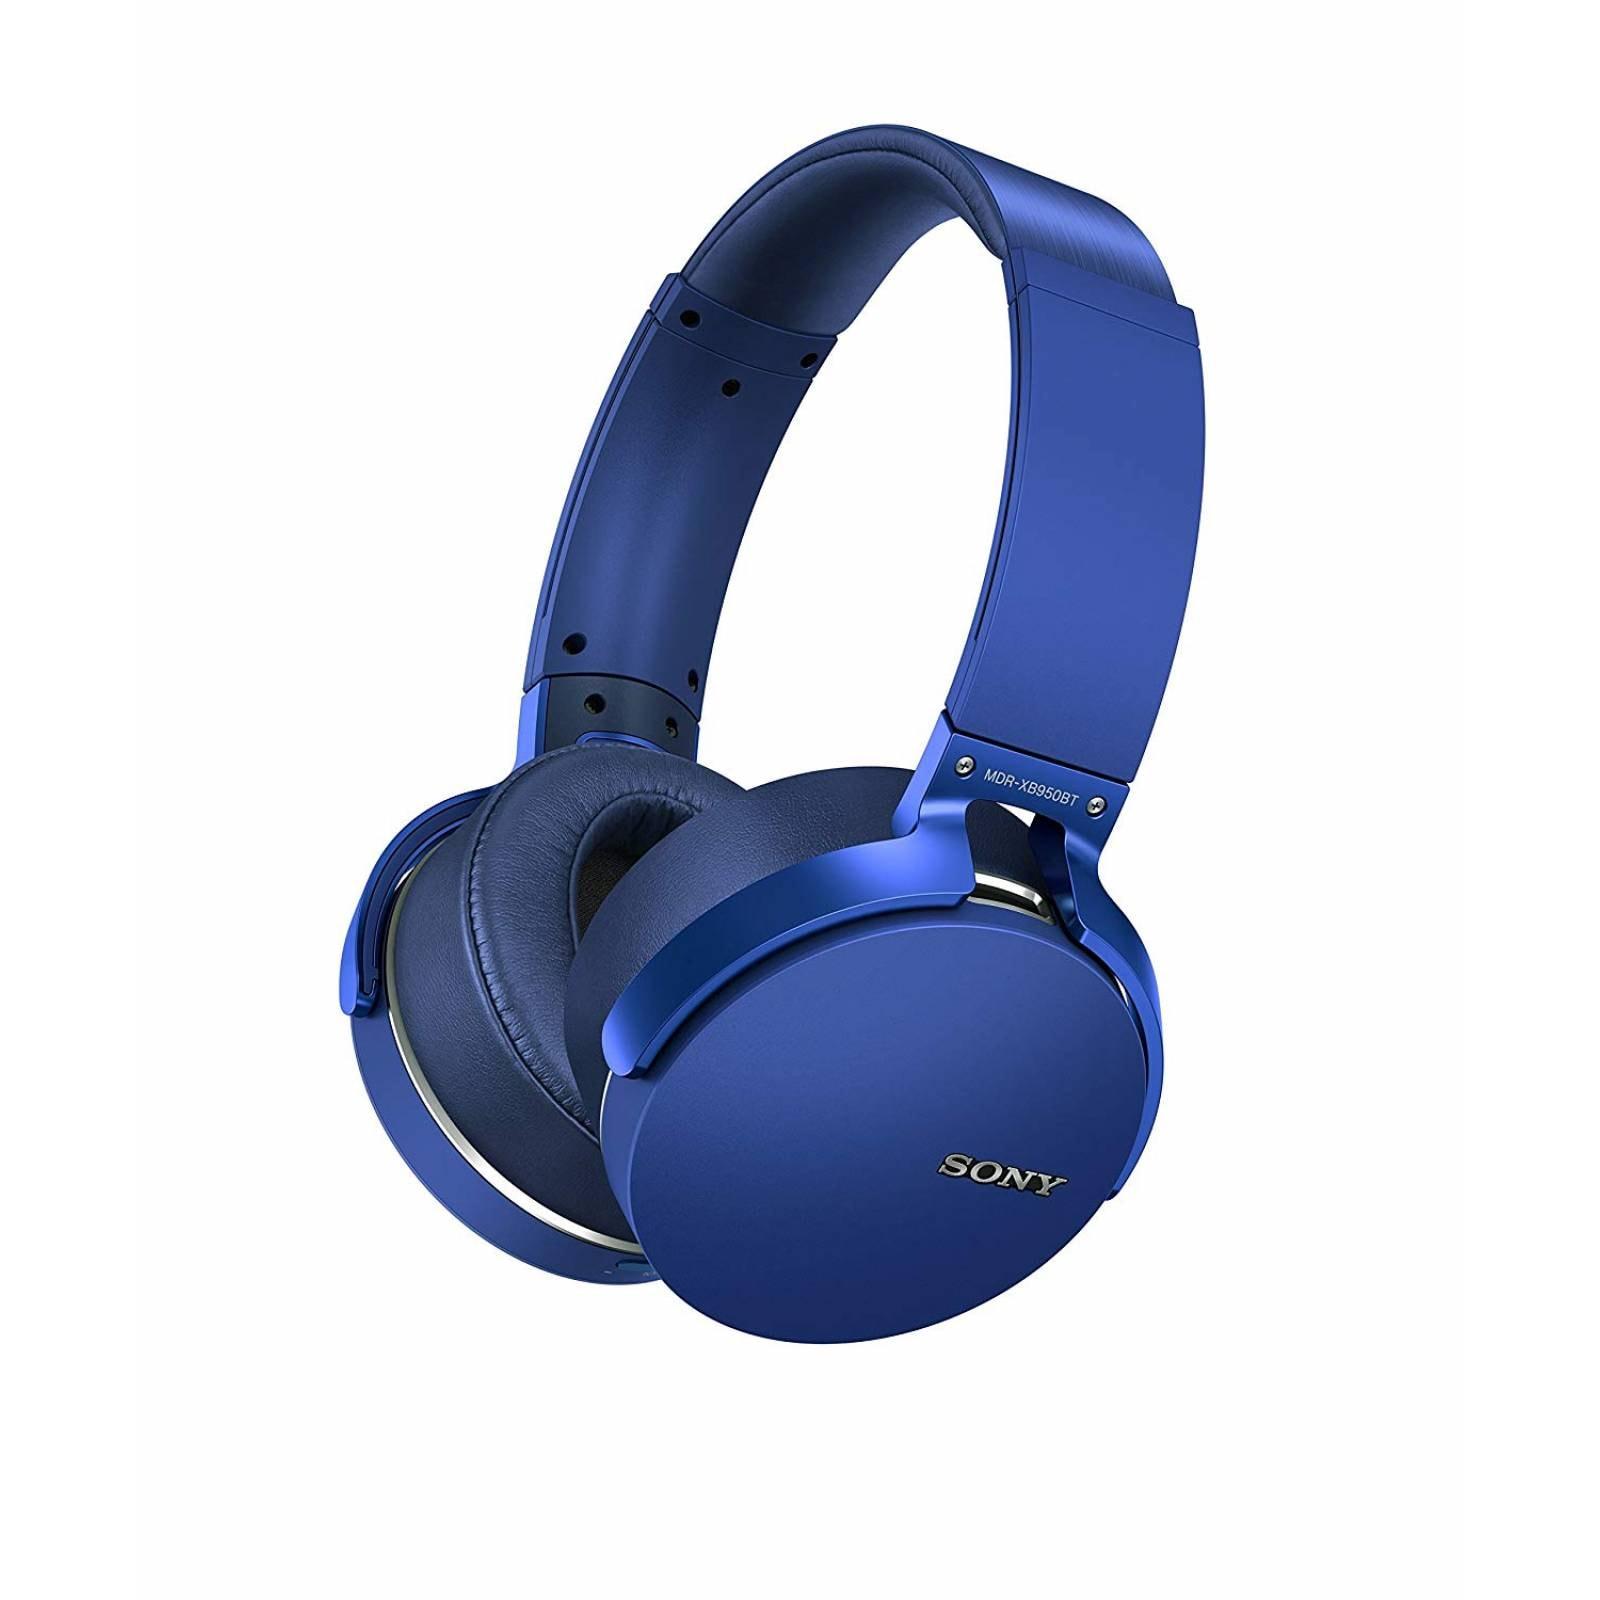 Audifonos inalambricos Sony XB950B1 EXTRA BASS Azul